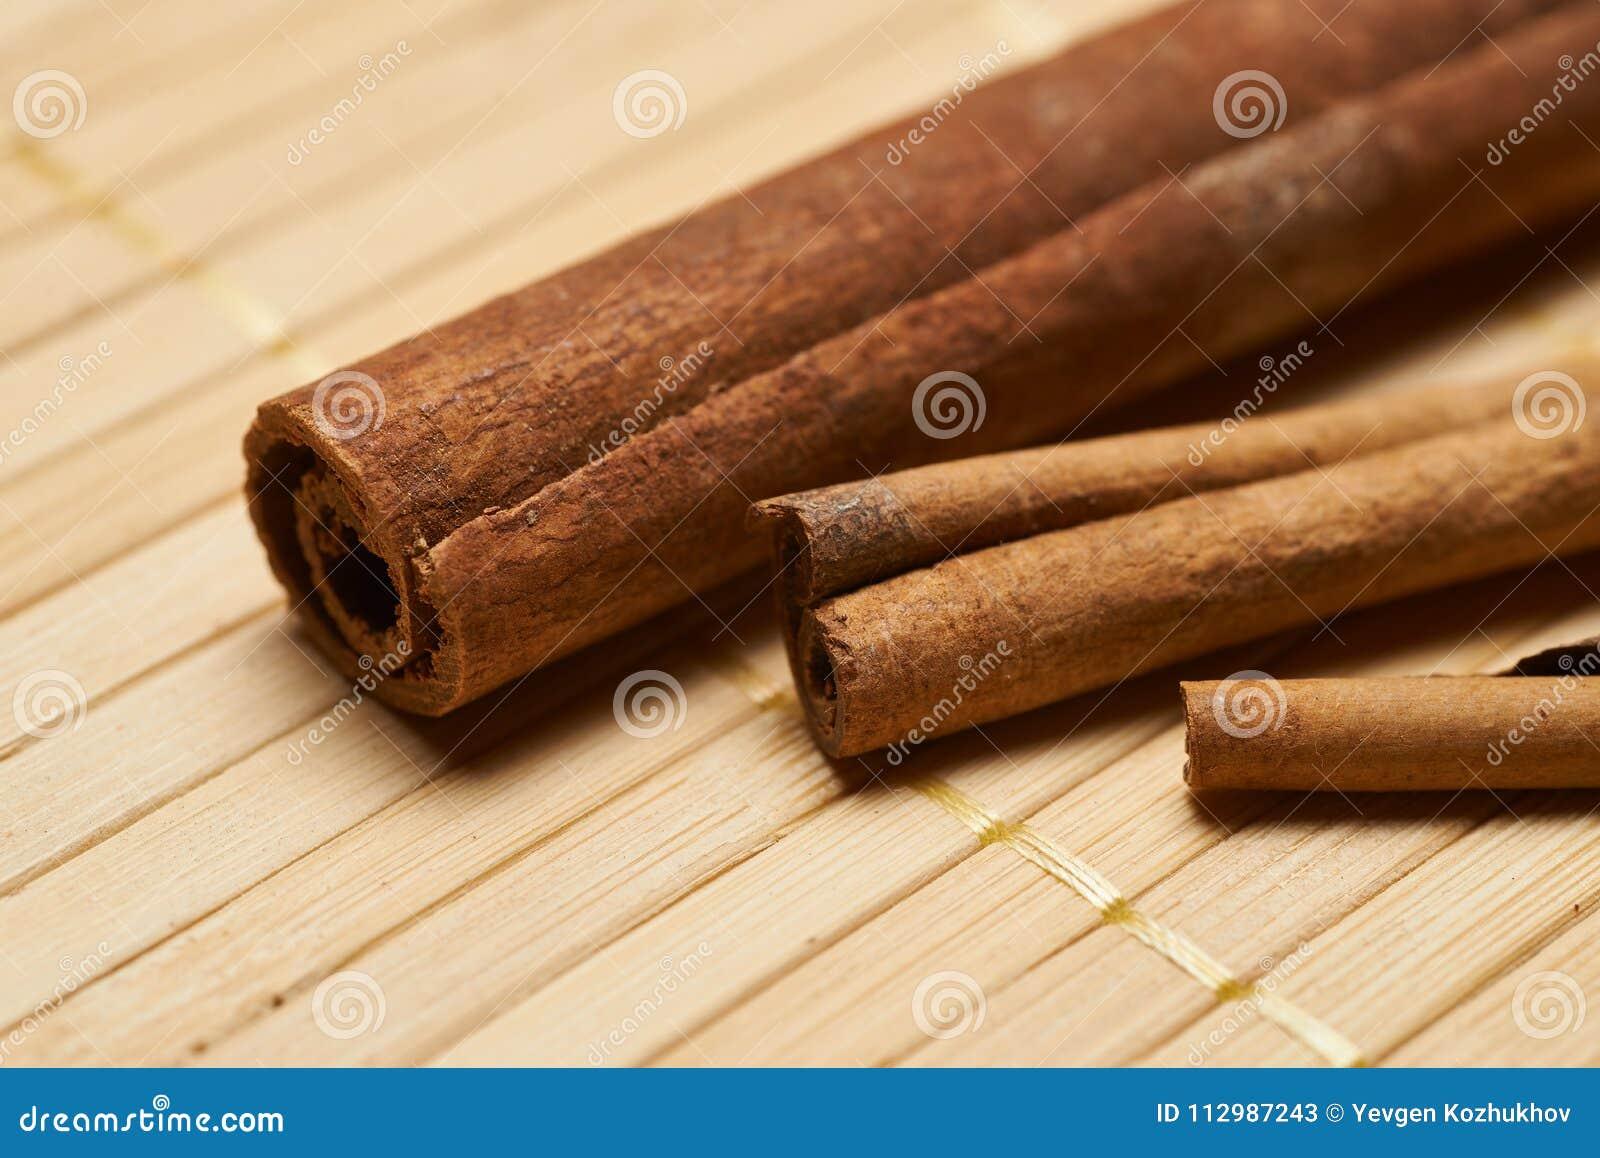 Cinnamon sticks on a bamboo background